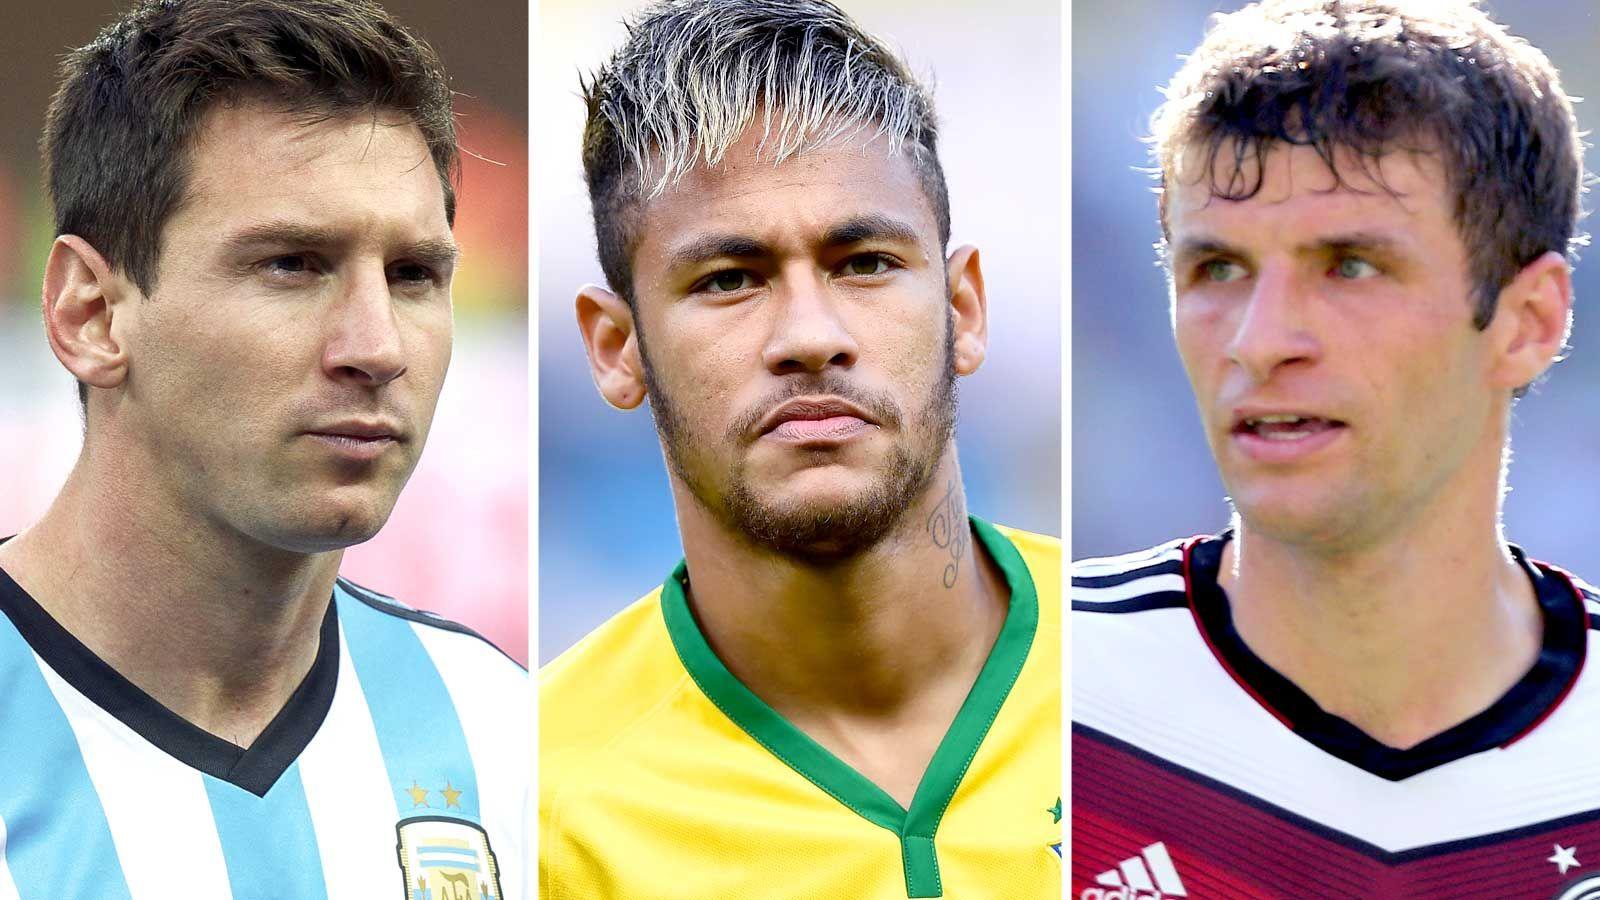 Messi Muller And Neymar Named In 10 Man Golden Ball Shortlist Lionel Messi Neymar Soccer Players